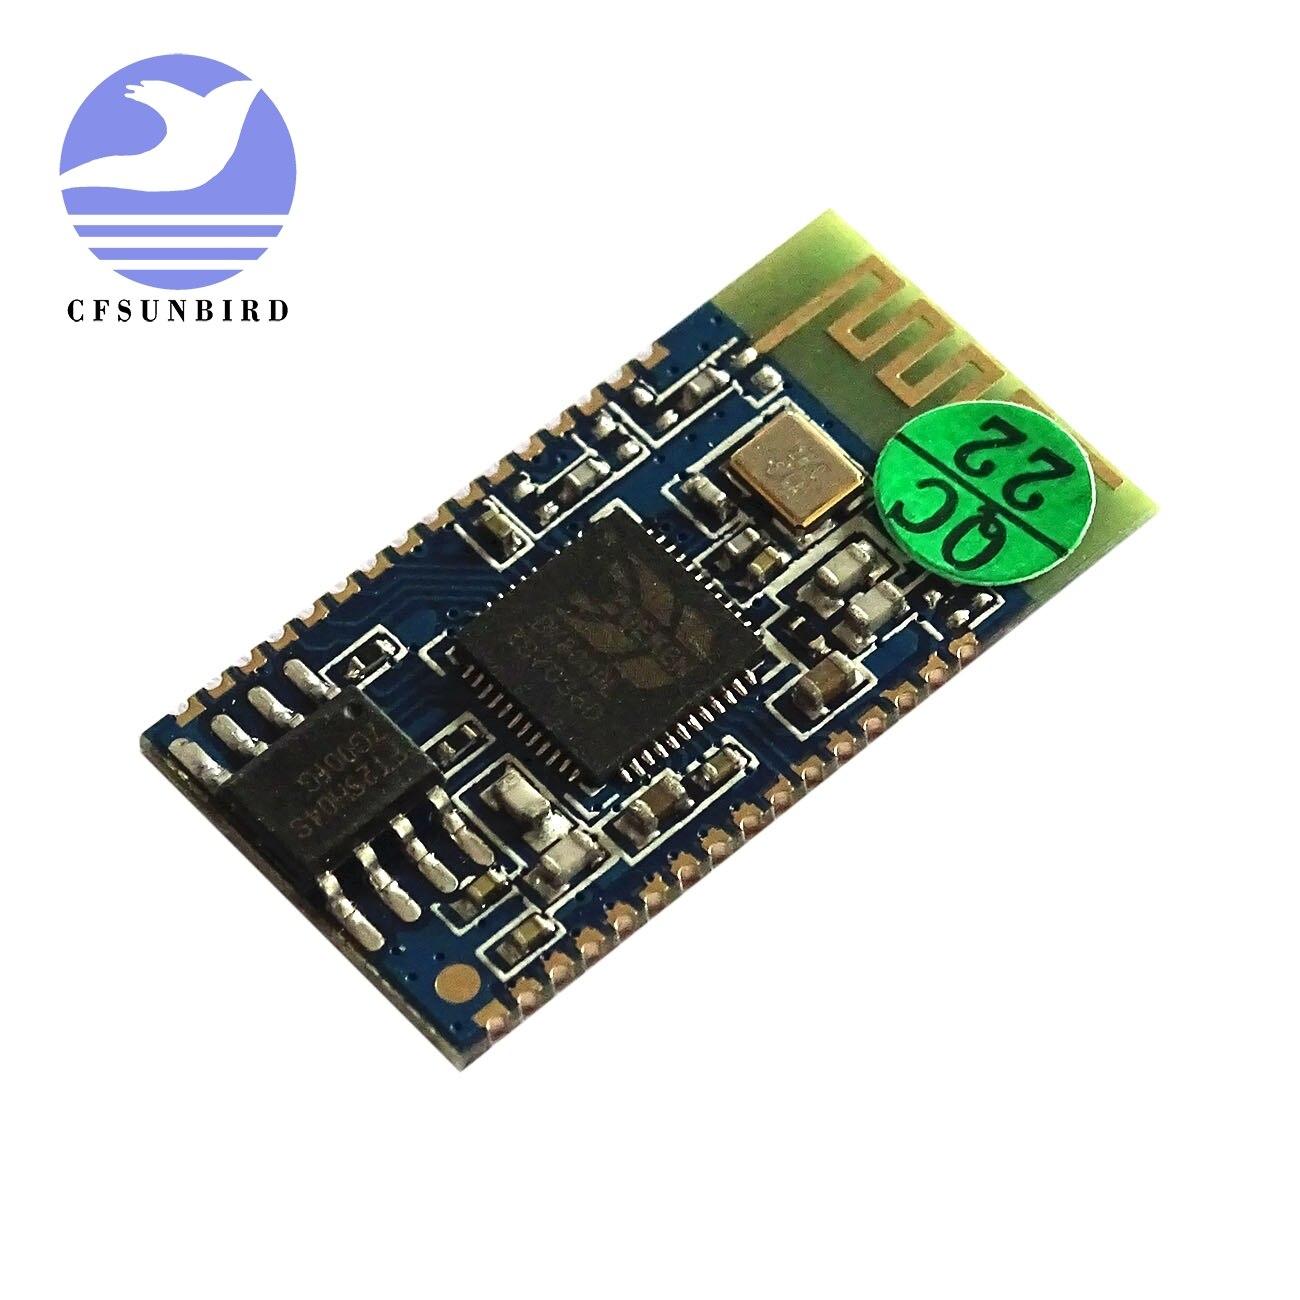 Aliexpress Com Buy Warriorsarrow Bluetooth Module: Aliexpress.com : Buy 1PCS CFsunbird Bluetooth Stereo Audio